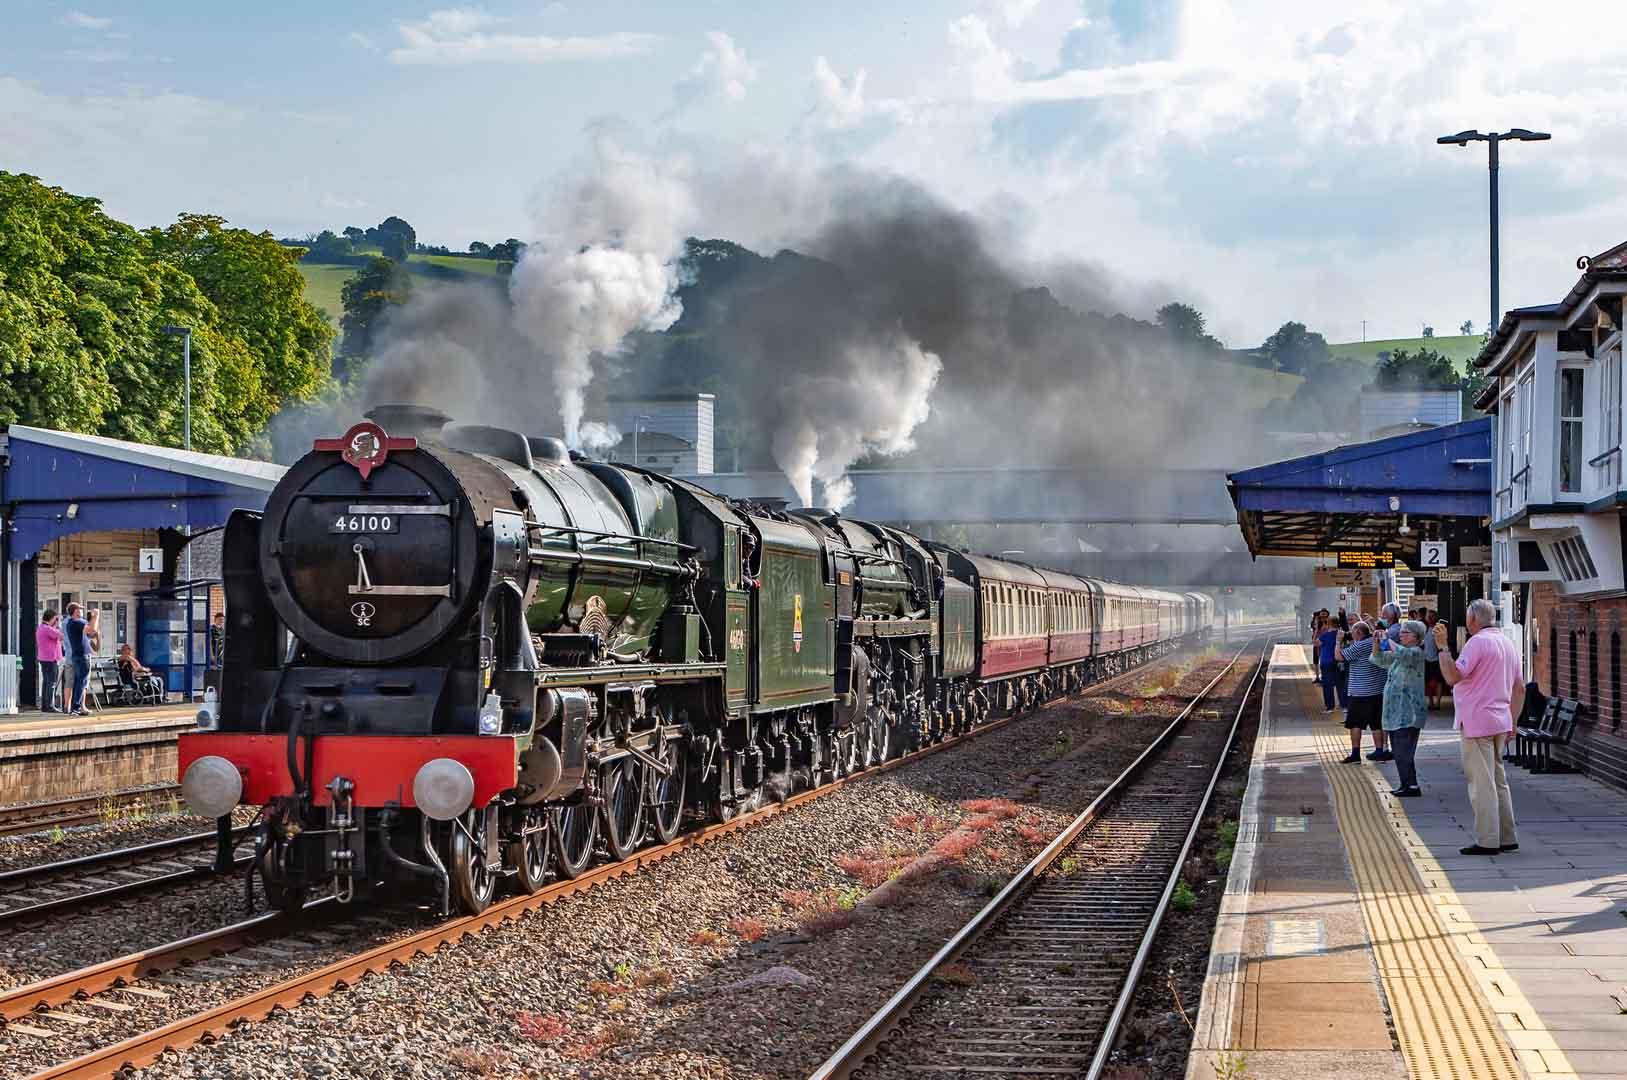 LMS-Royal-Scot-Class-7P-4-6-0-No-46100-Royal-Scot-BR-Standard-Class-7-70000-Britannia-D1935-47805-Colin-Wallace